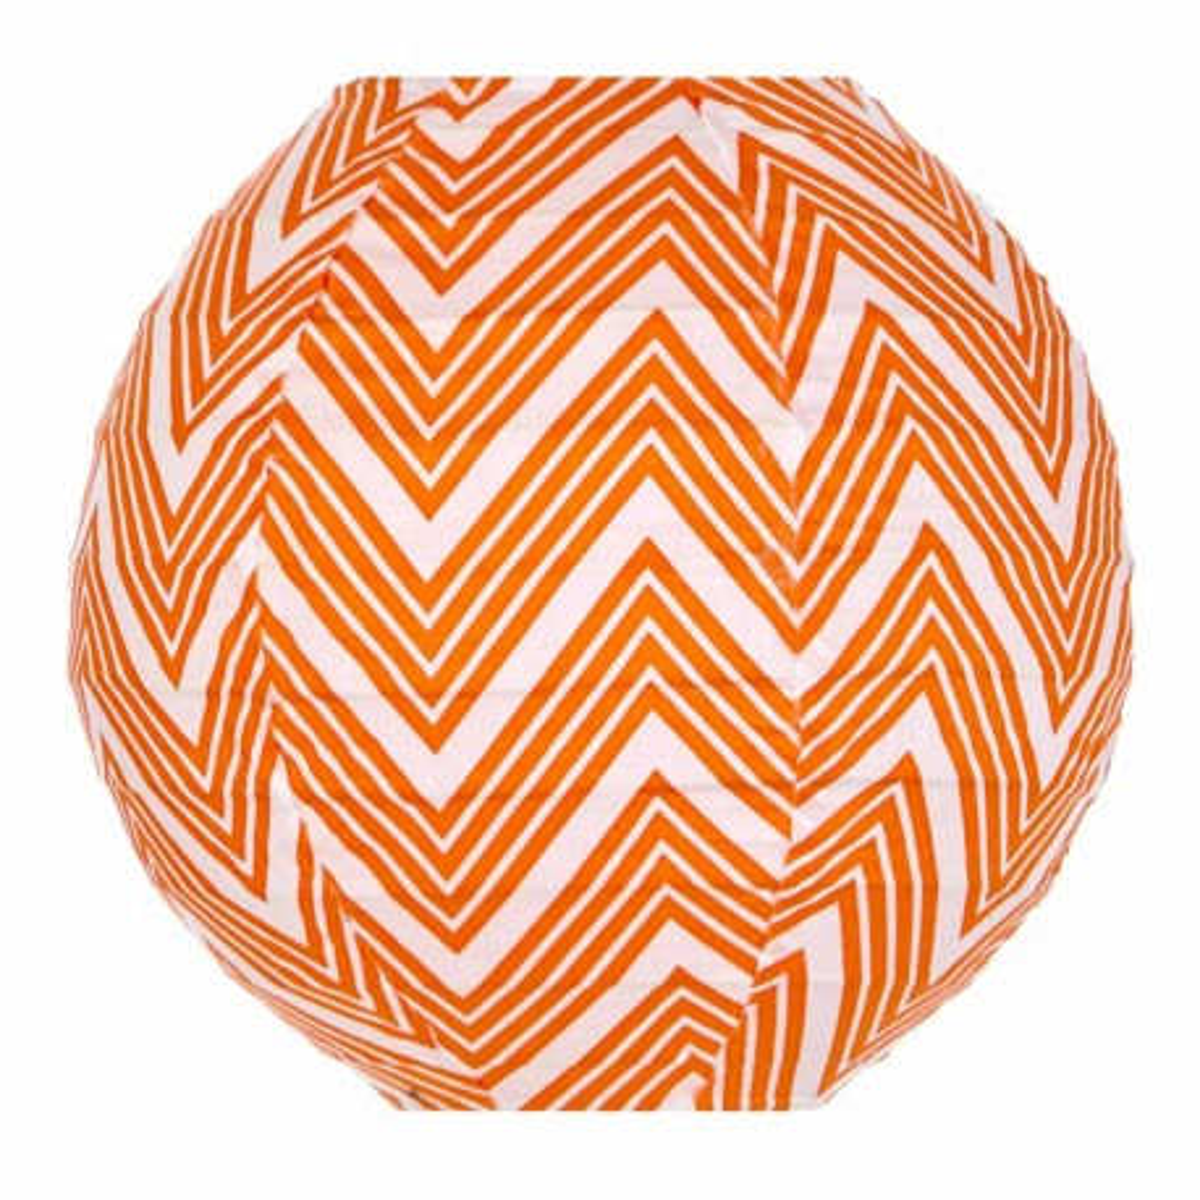 Lampion tissu mini rond Zig zag orange